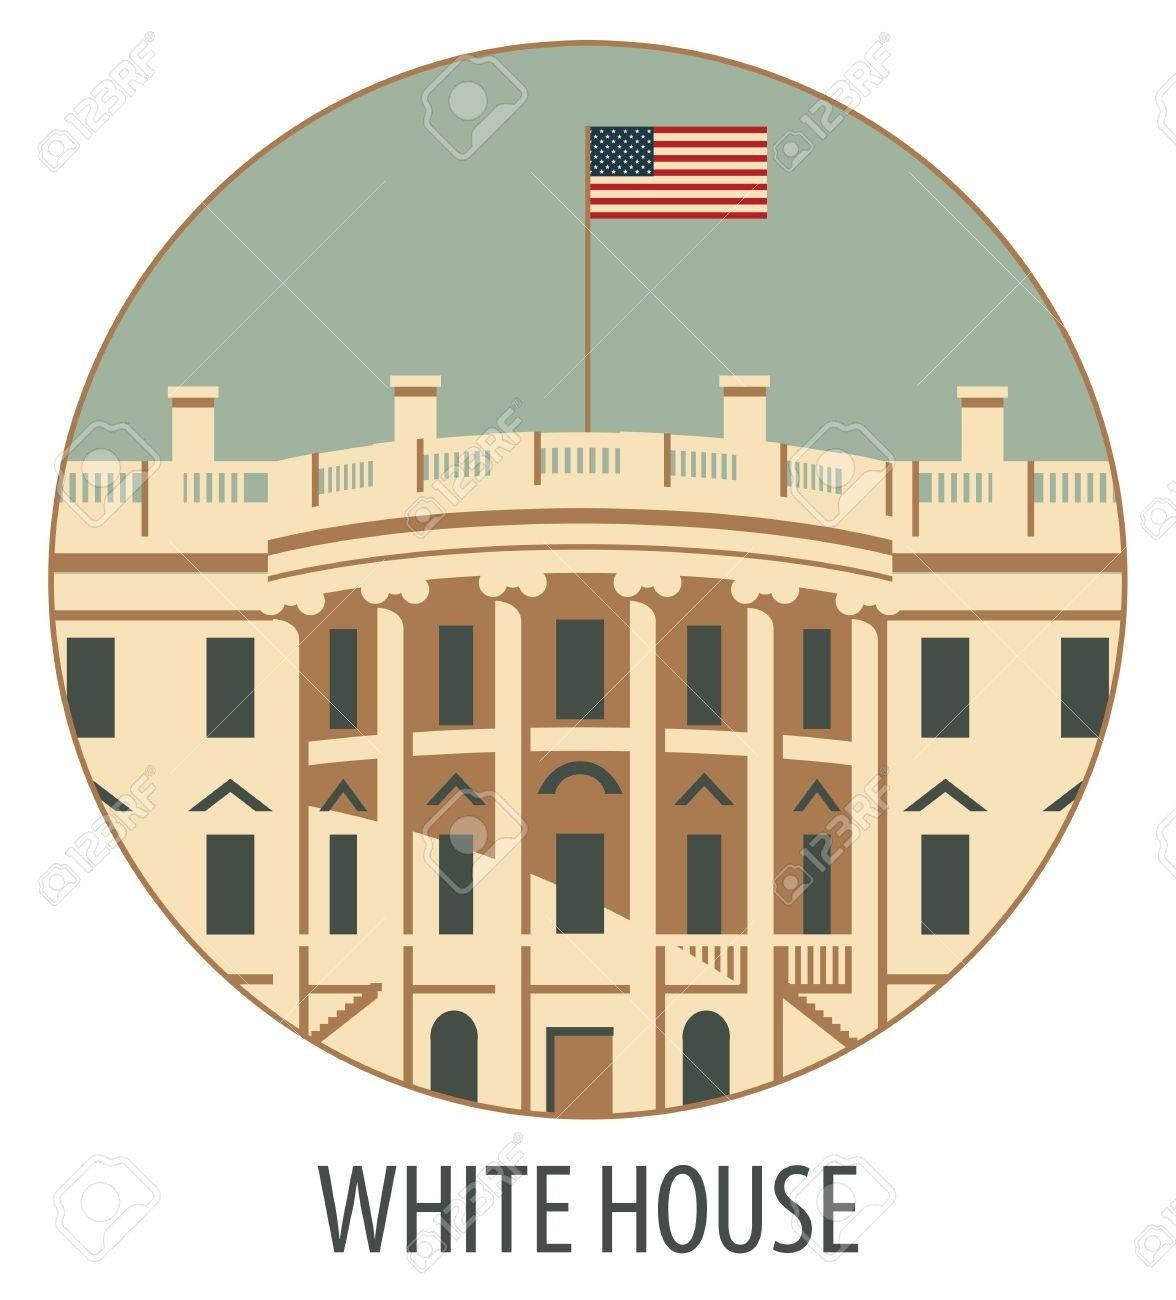 1176x1300 55799438 Vector Illustration White House Washington Dc With Flag